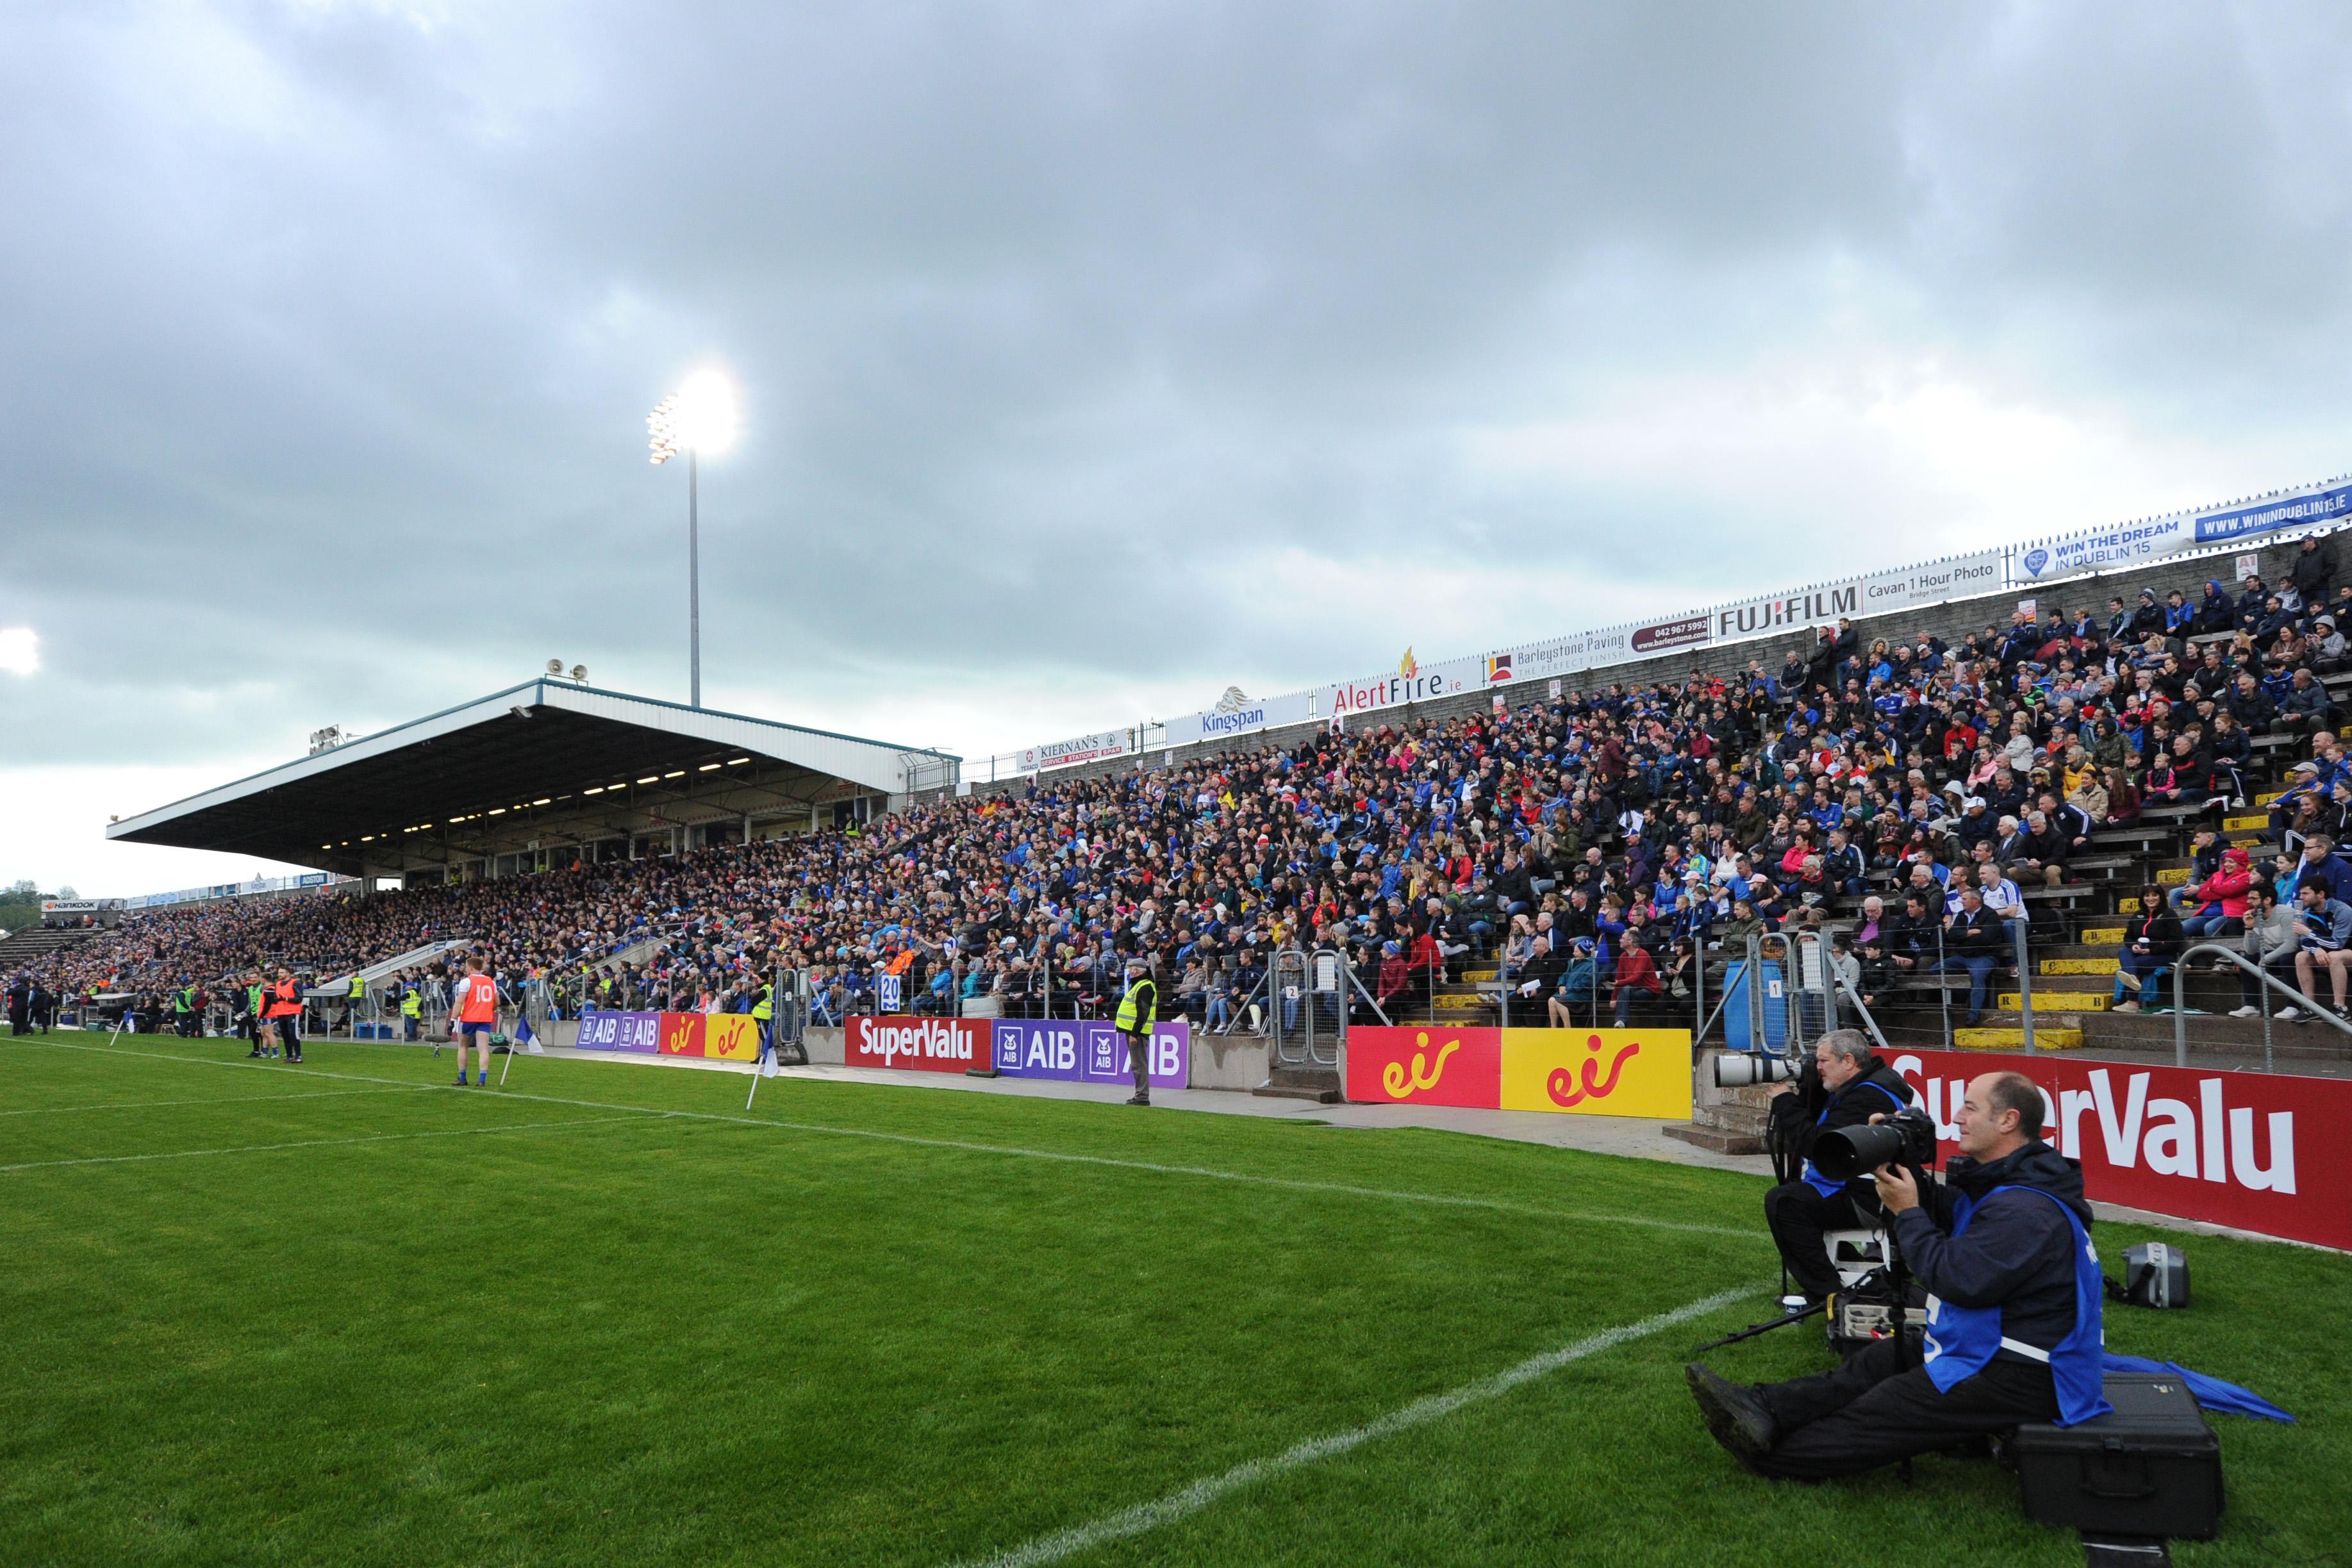 Arrangements confirmed for Ulster Senior Football Championship semi-finals